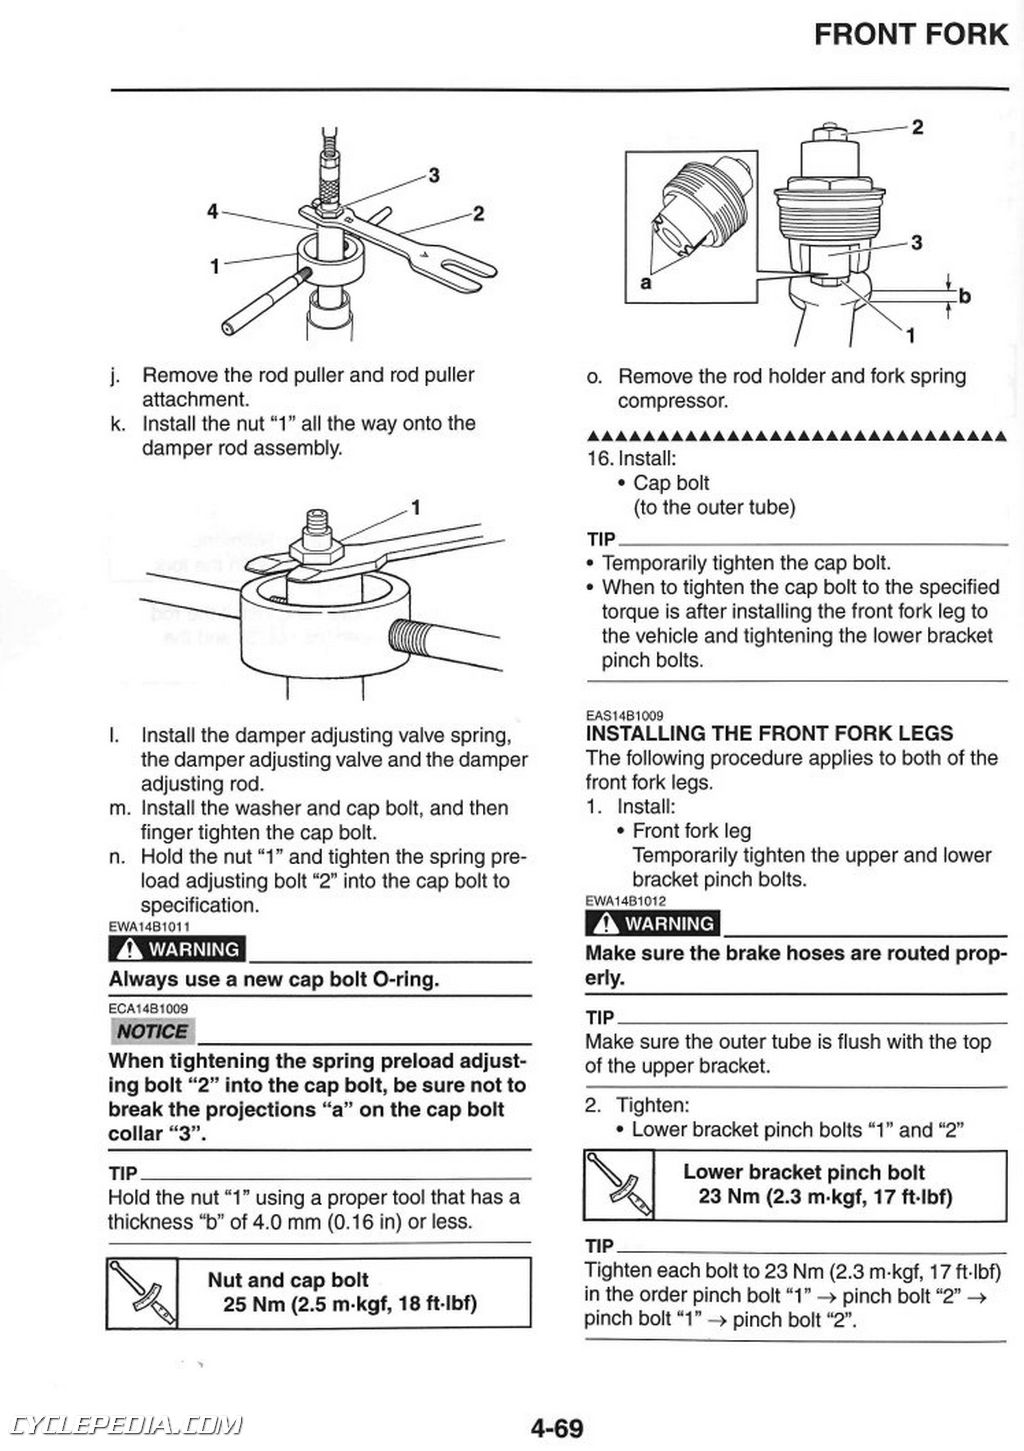 2012 %E2%80%93 2014 Yamaha YZFR1B YZF R1 Motorcycle Service Manual page 2?resize\\\\\\\\\\\=665%2C942\\\\\\\\\\\&ssl\\\\\\\\\\\=1 trx 250r wiring diagram trx 450 wiring diagram, trx 250r engine trx 250r wiring harness at honlapkeszites.co